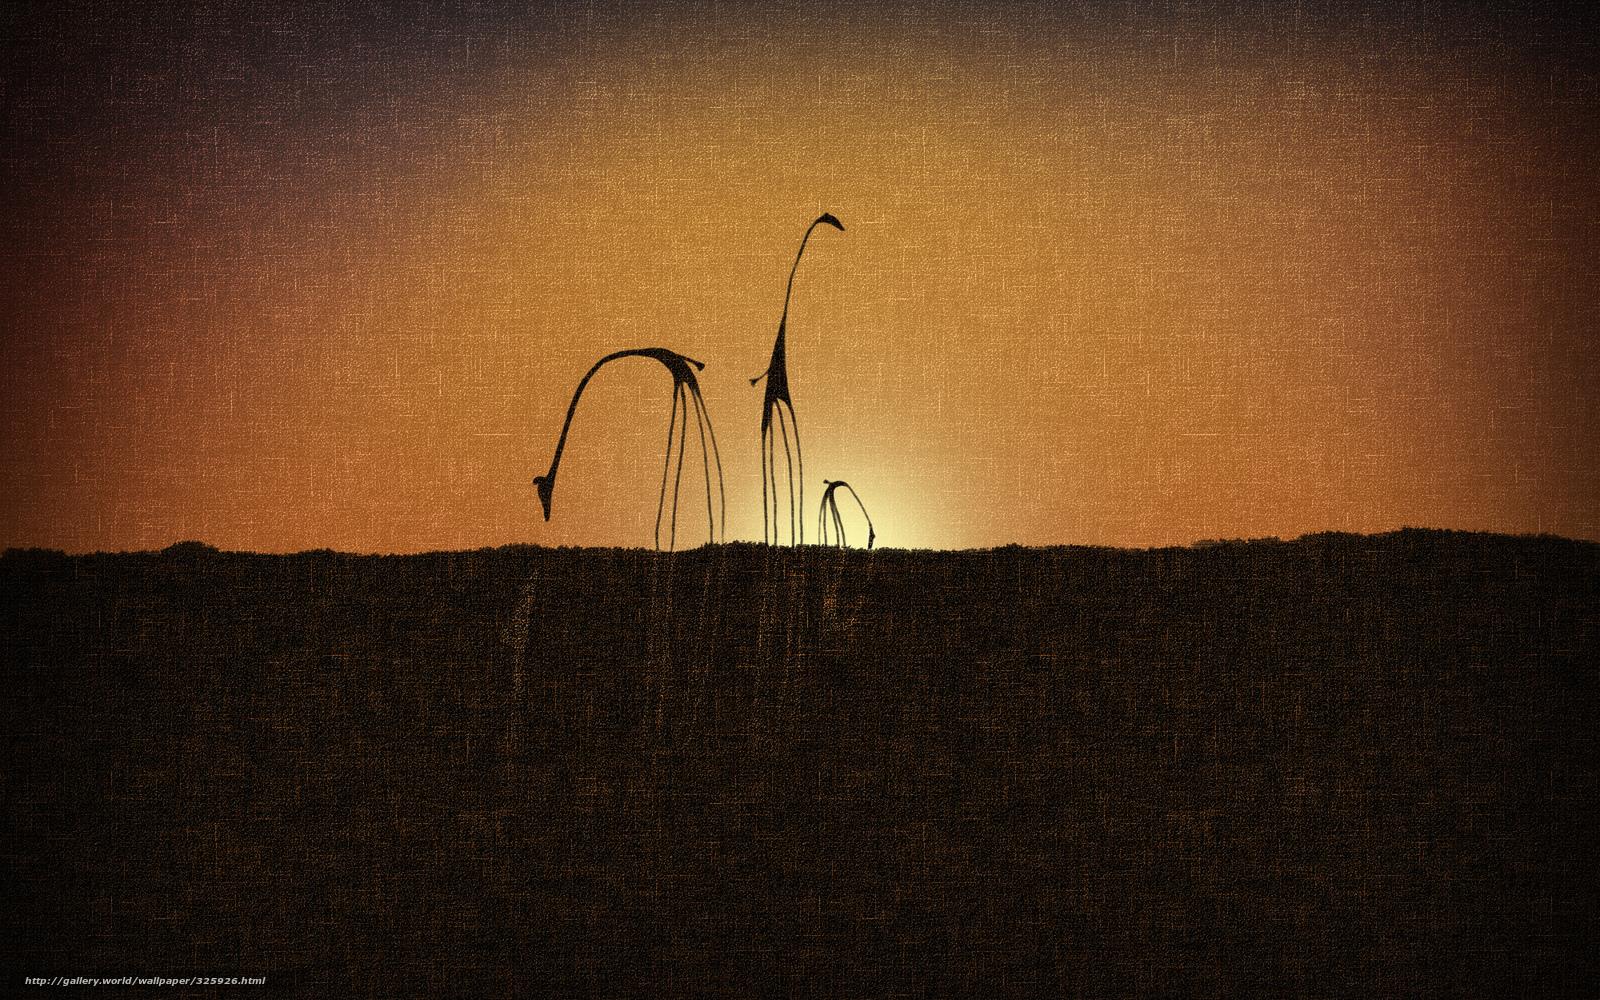 Tlcharger fond d 39 ecran style girafes coucher du soleil for Fond ecran style